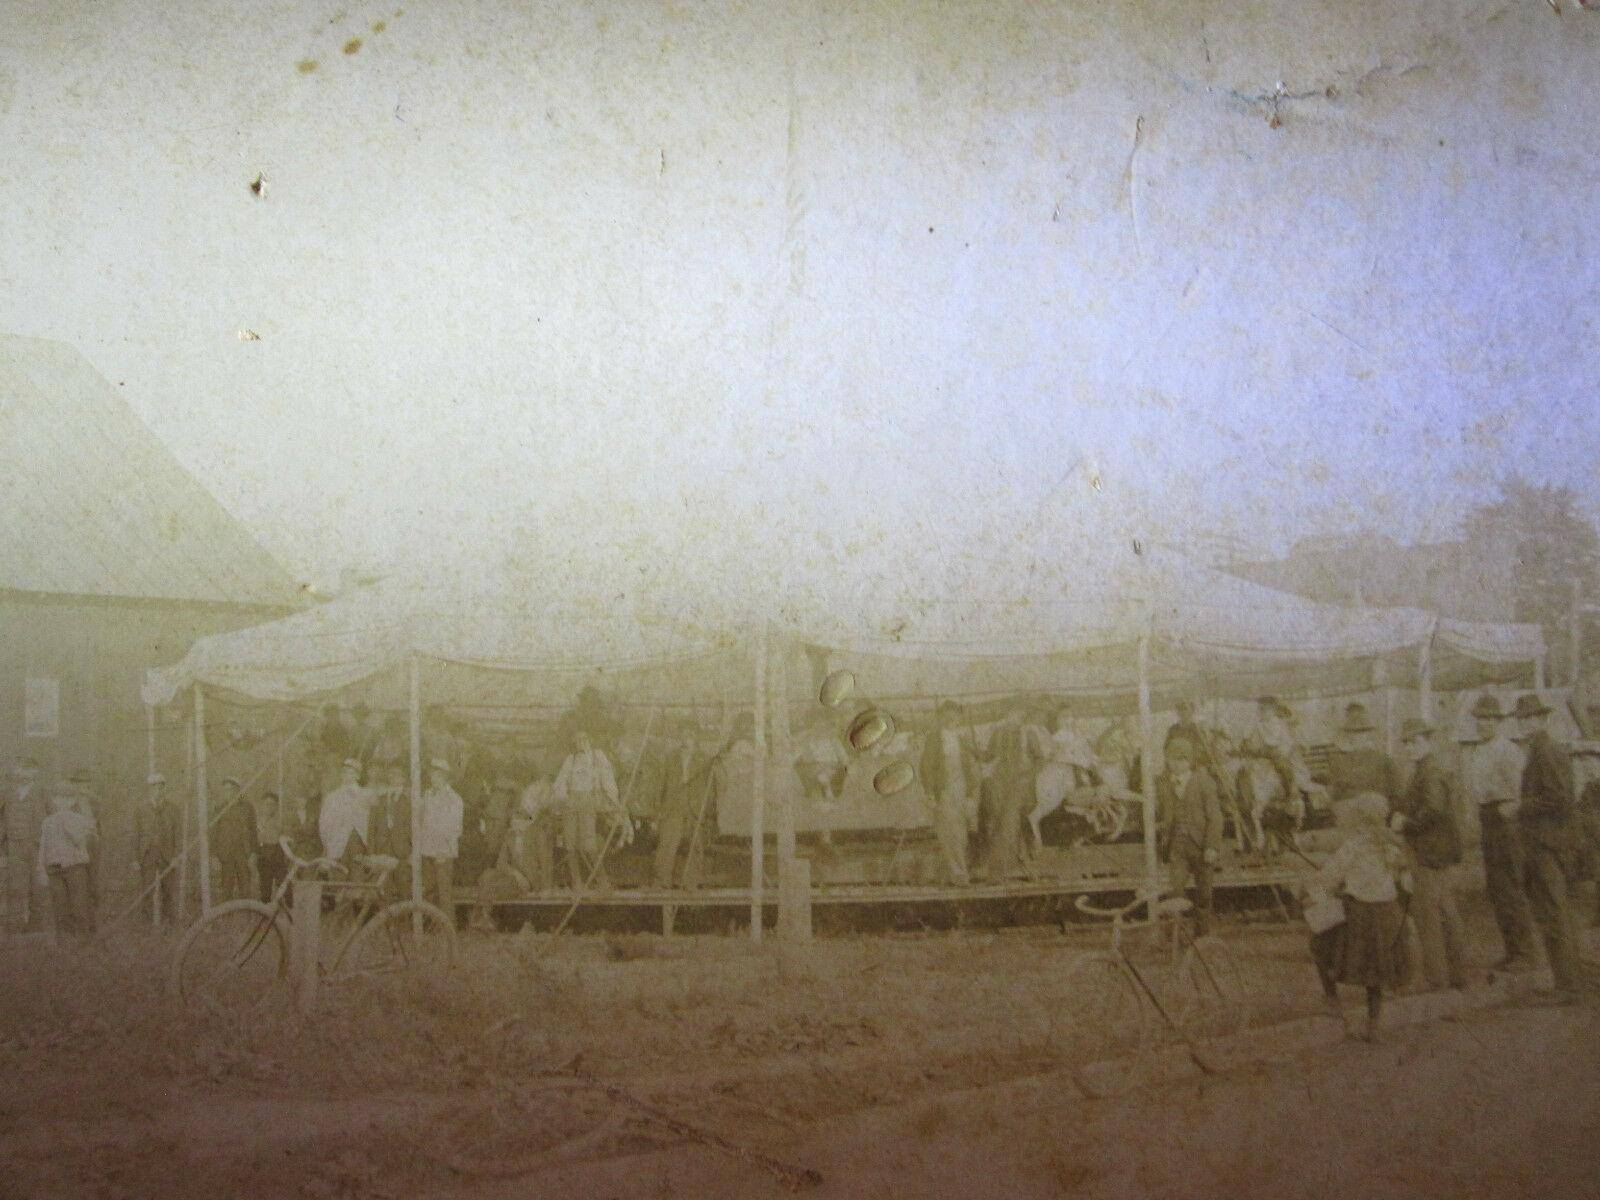 Antique AMERICAN CIRCUS CARNIVAL MERRY GO ROUND HORSE BIKE EDWARDIAN RARE PHOTO   [ ]